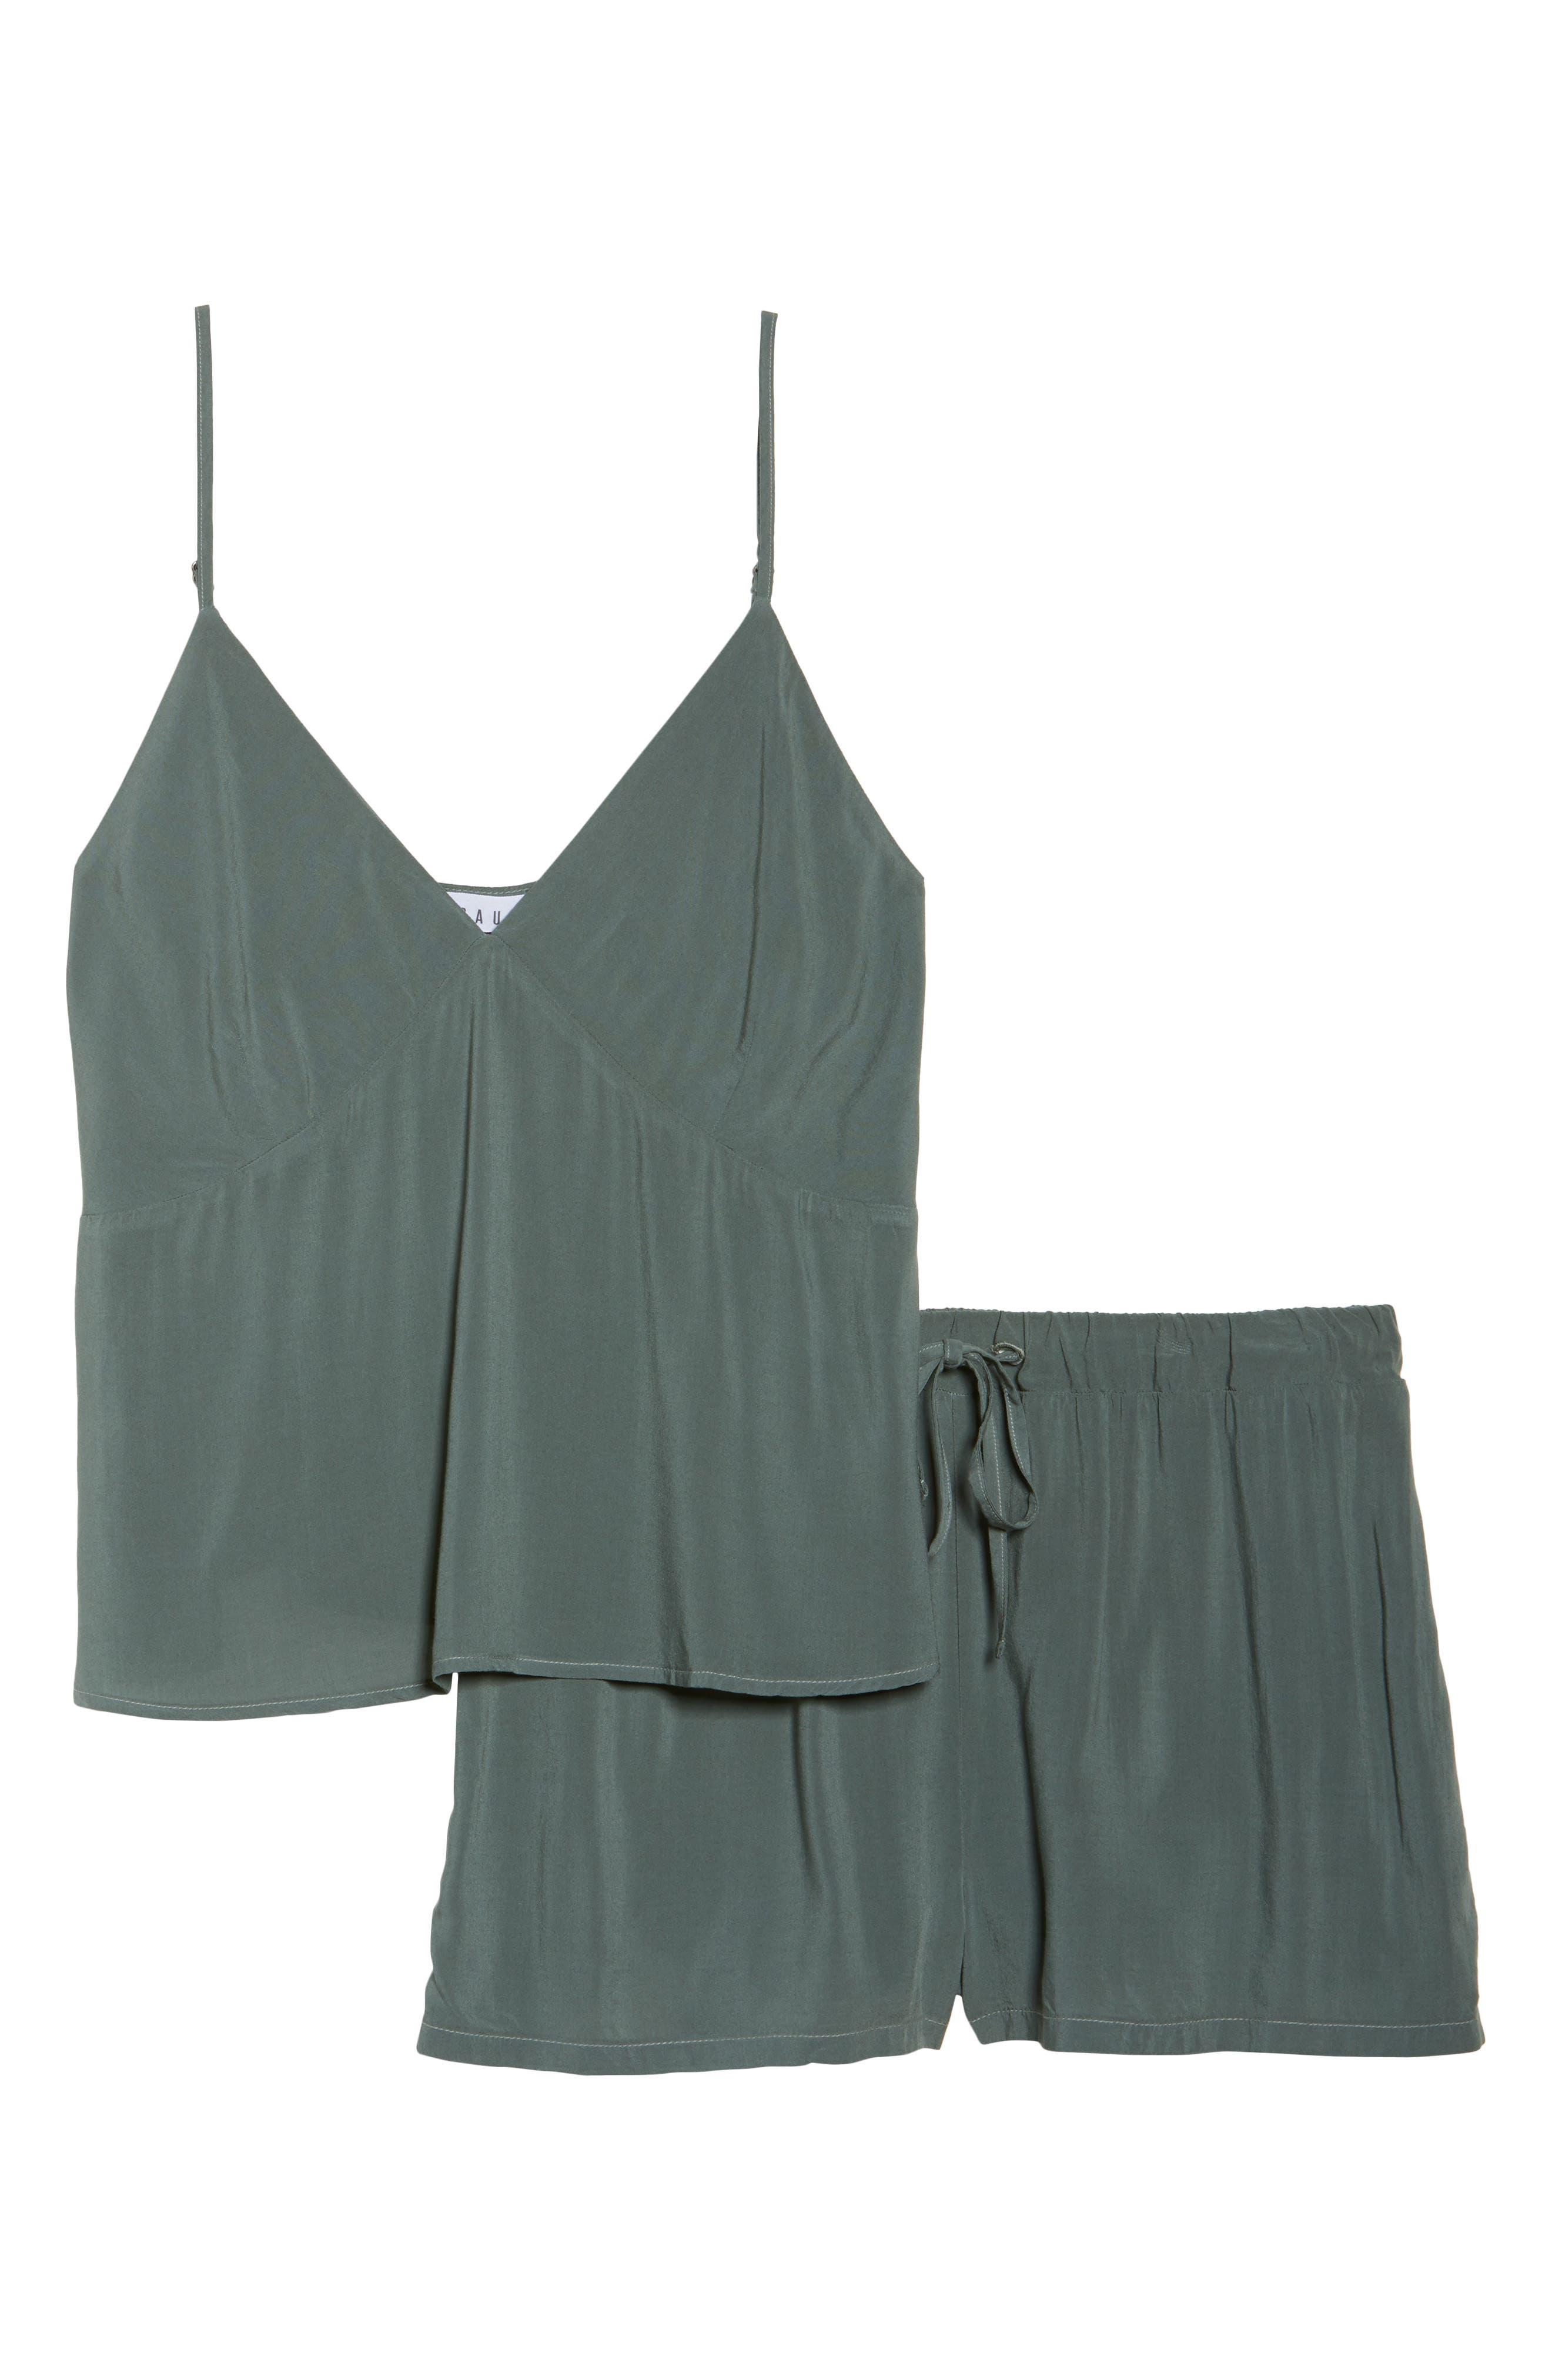 Poppy Short & Camisole Pajamas,                             Alternate thumbnail 6, color,                             440